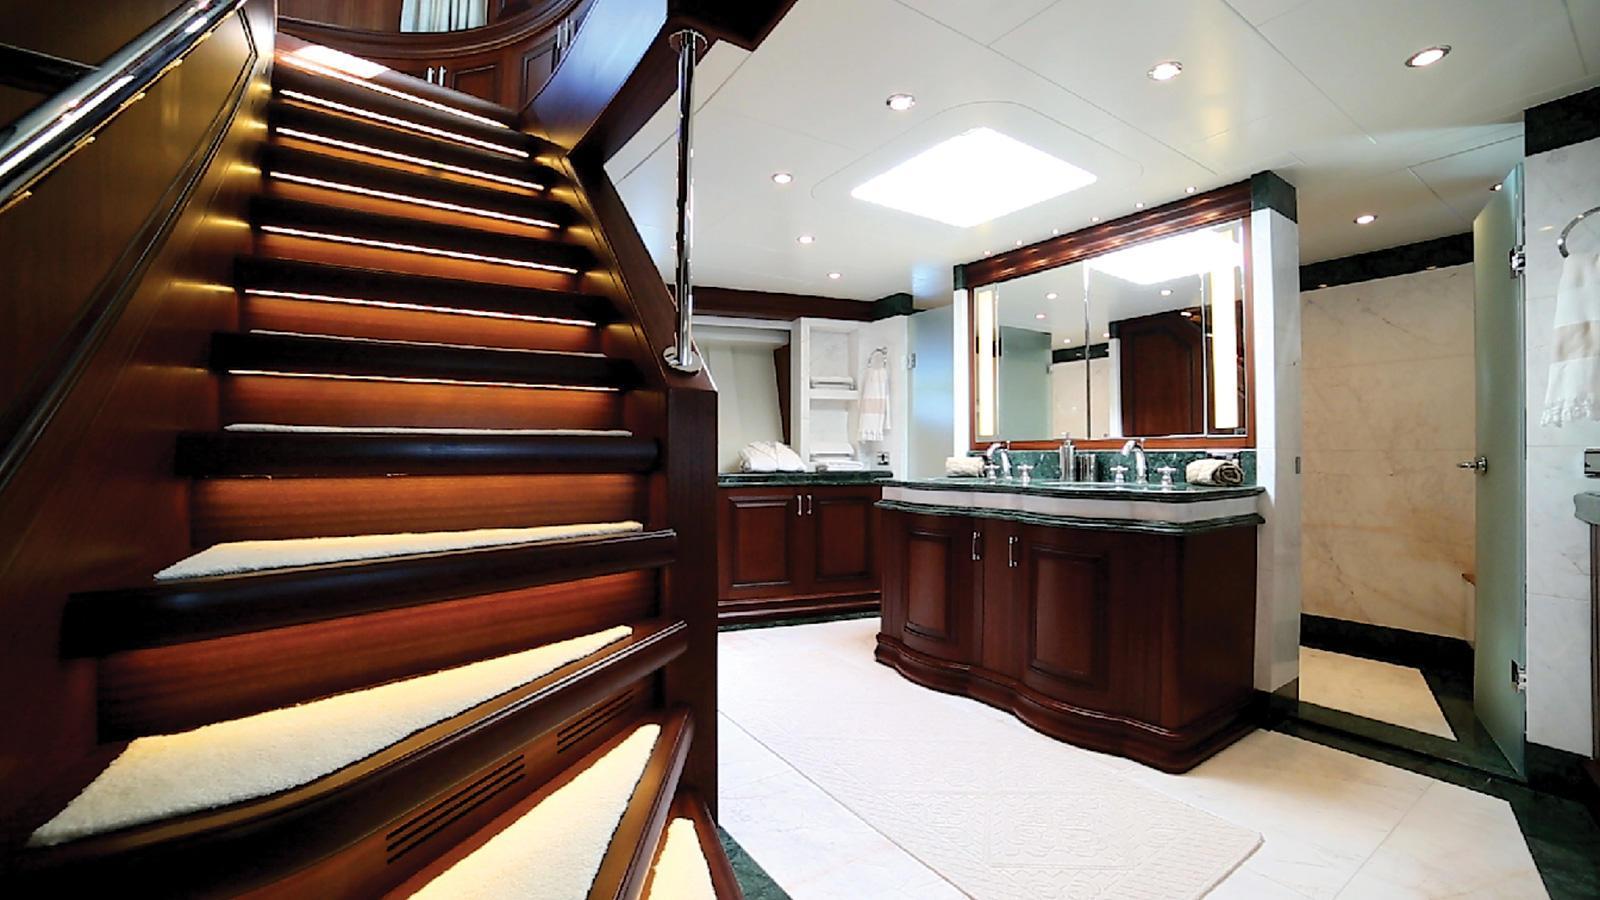 clarity-motor-yacht-bilgin-classic-160-2015-49m-master-bathroom